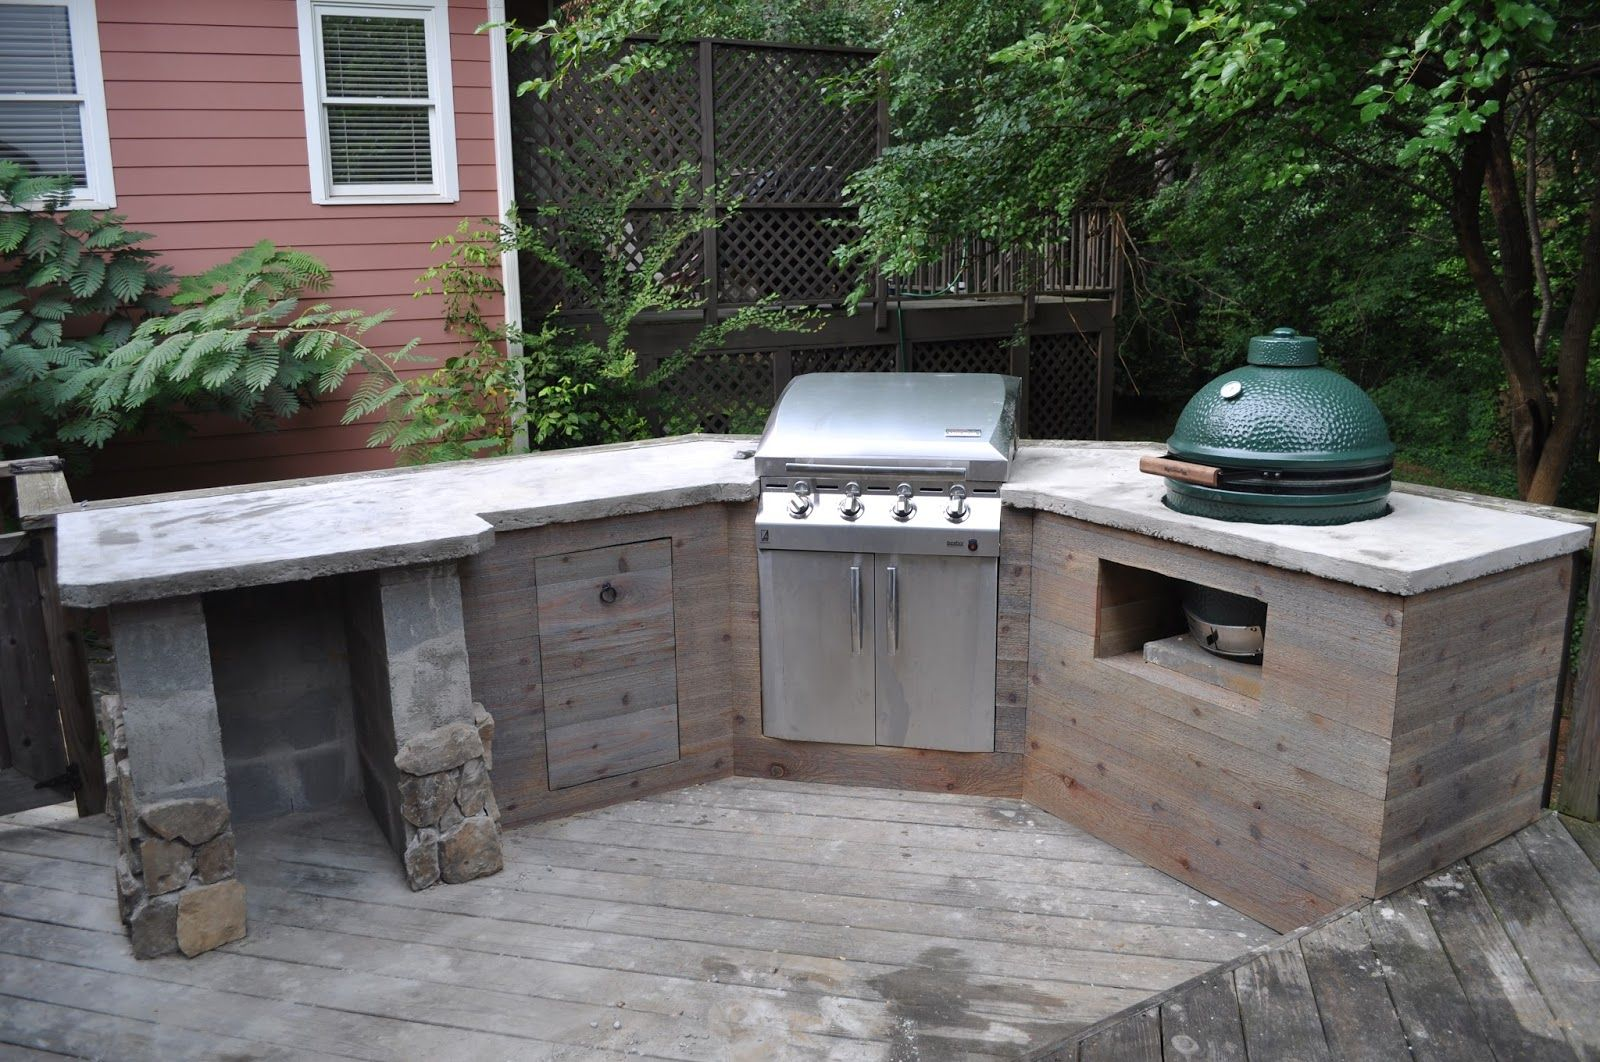 Diy outdoor kitchen kits  Related image  KS  Pinterest